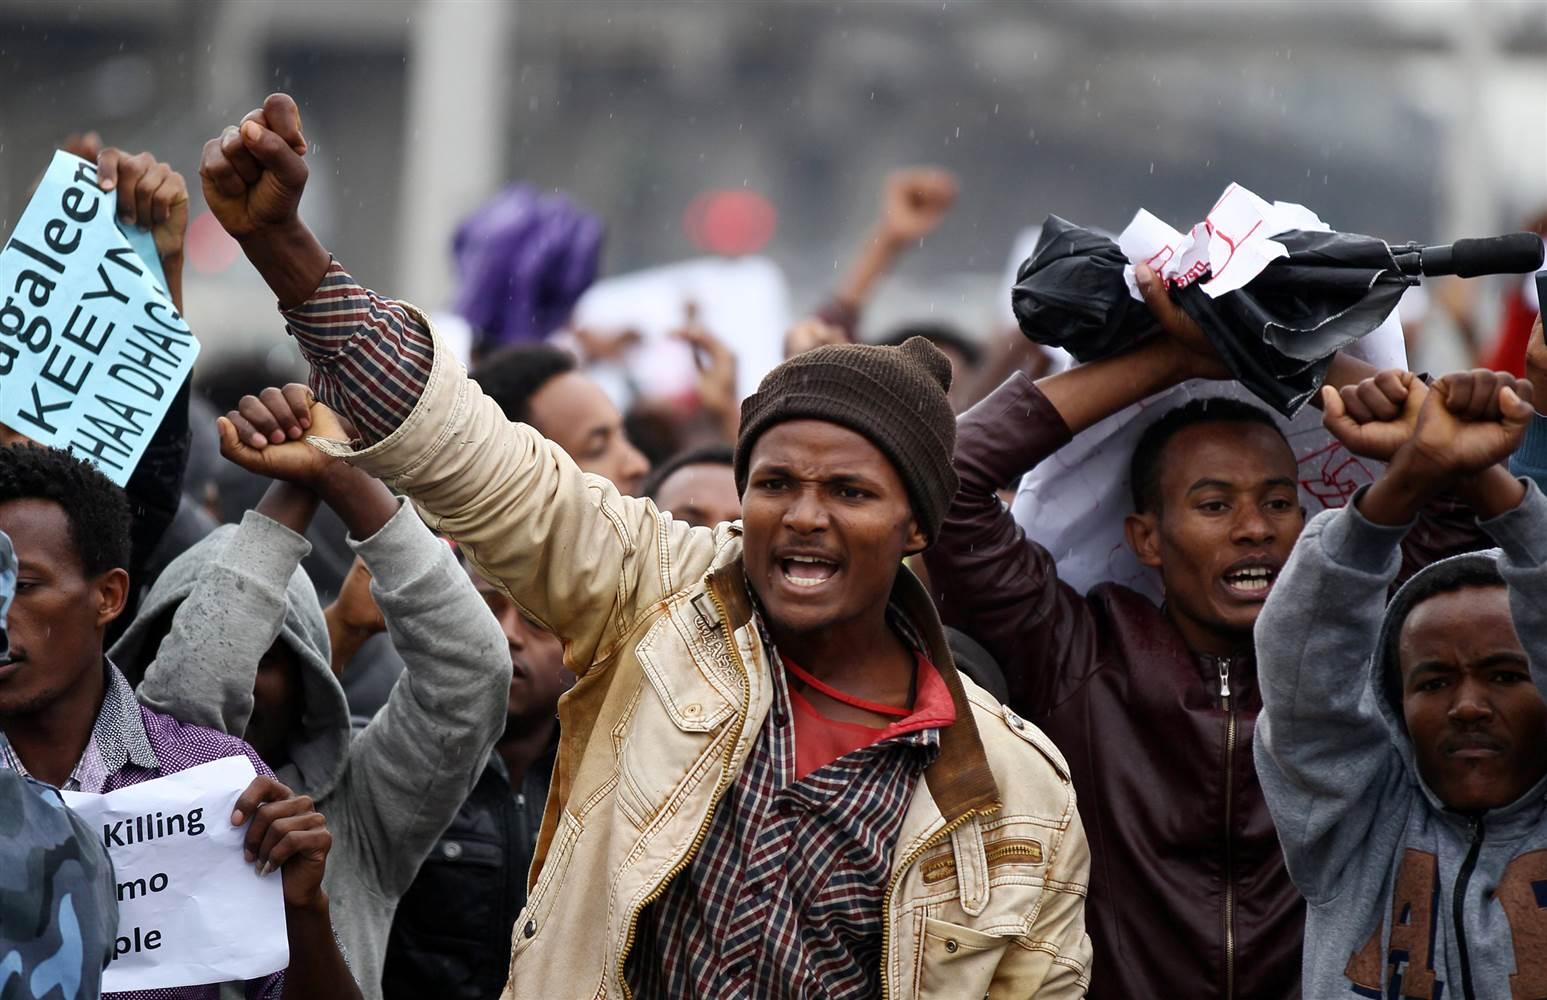 https://1.bp.blogspot.com/-45i14khuPnM/V61gvZyBGPI/AAAAAAAAUEo/9POn-jCMo1kdPnVqUBepe0MBkbjB1oS4ACLcB/s1600/ethiopian%2Bprotesters%2Bin%2Baddis%2Bababa%2B2.jpg